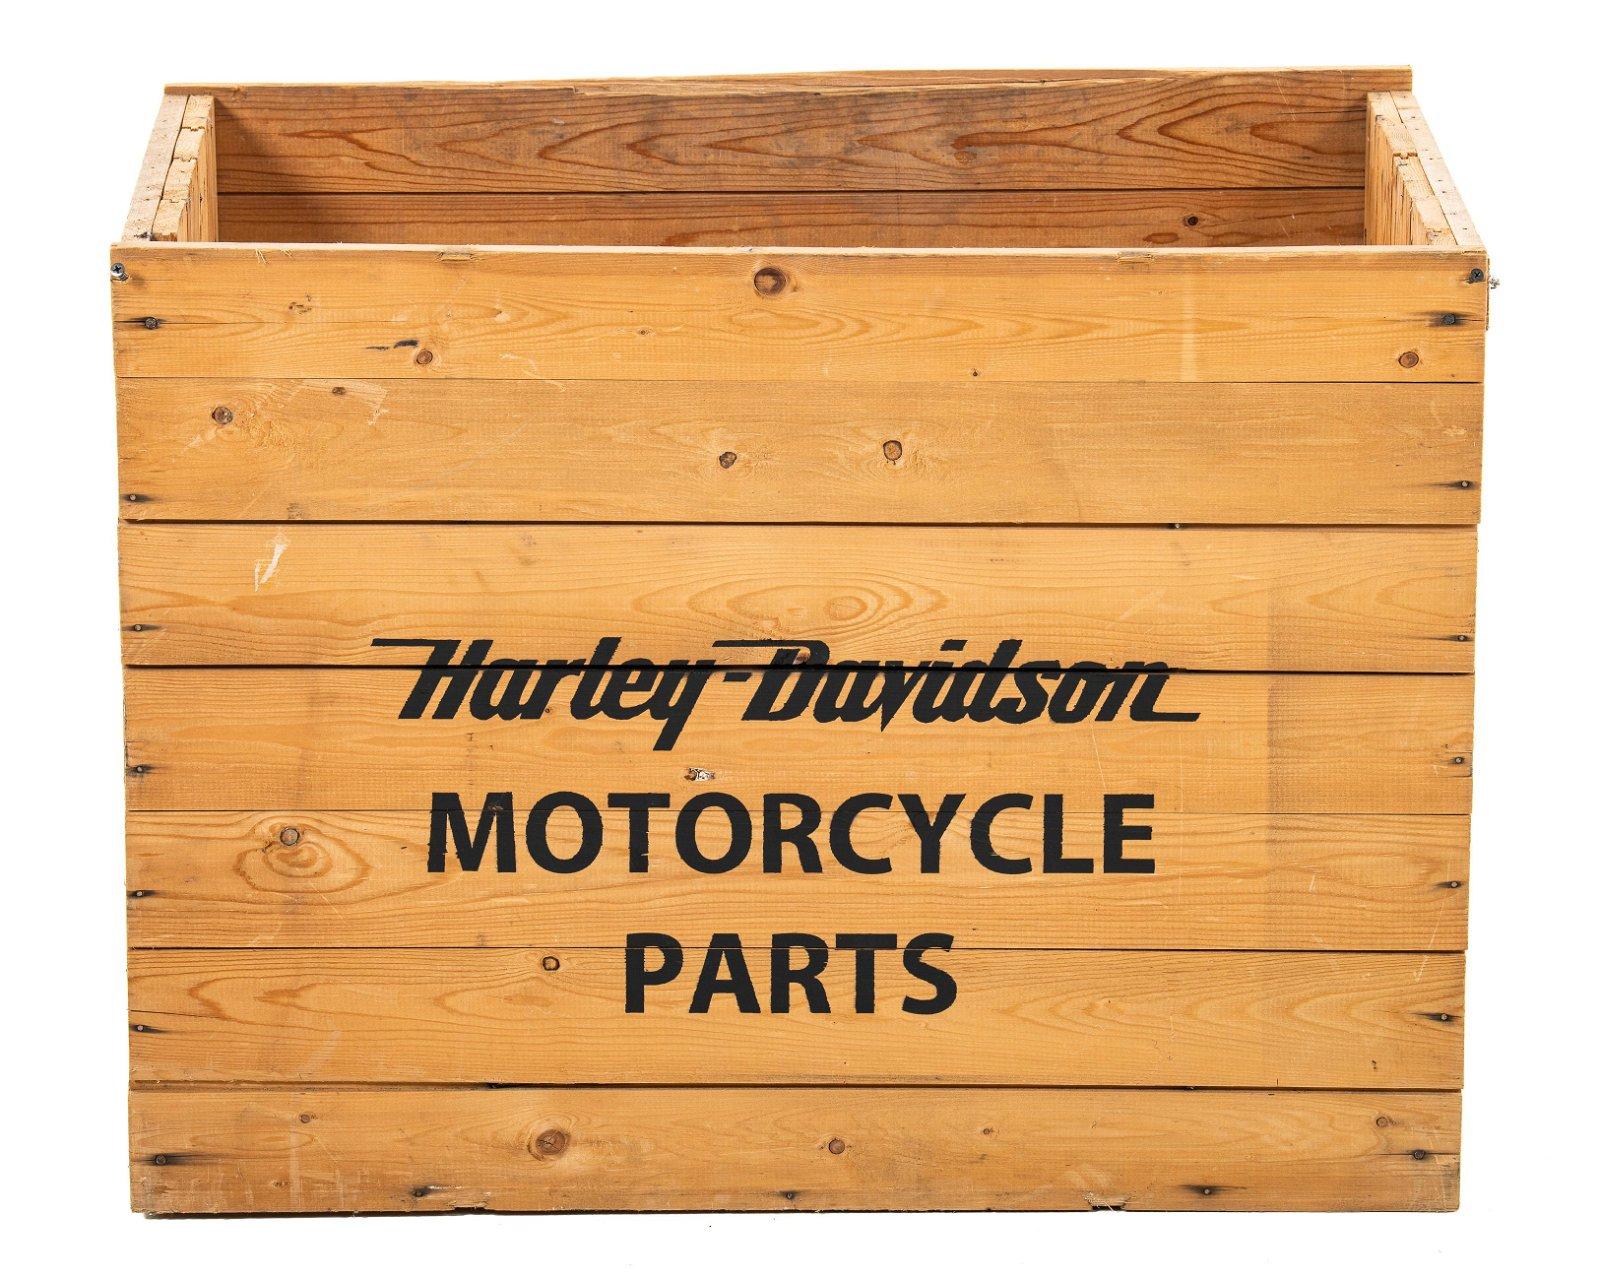 Harley Davidson Motorcycle Parts Wood Crate